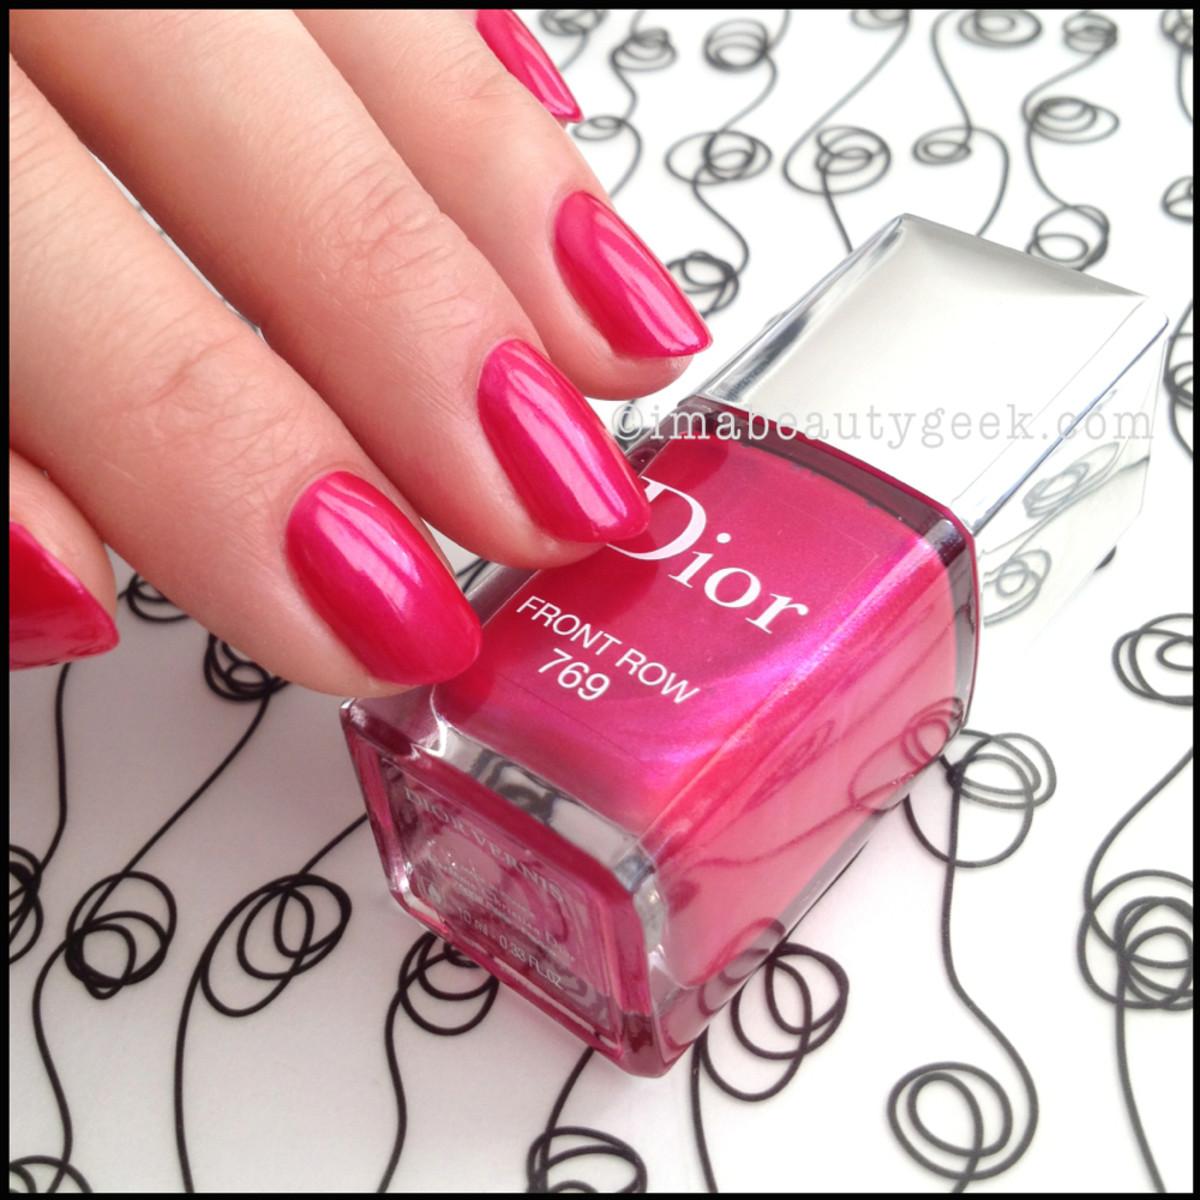 Dior polish Front Row 769_Dior Gel Shine